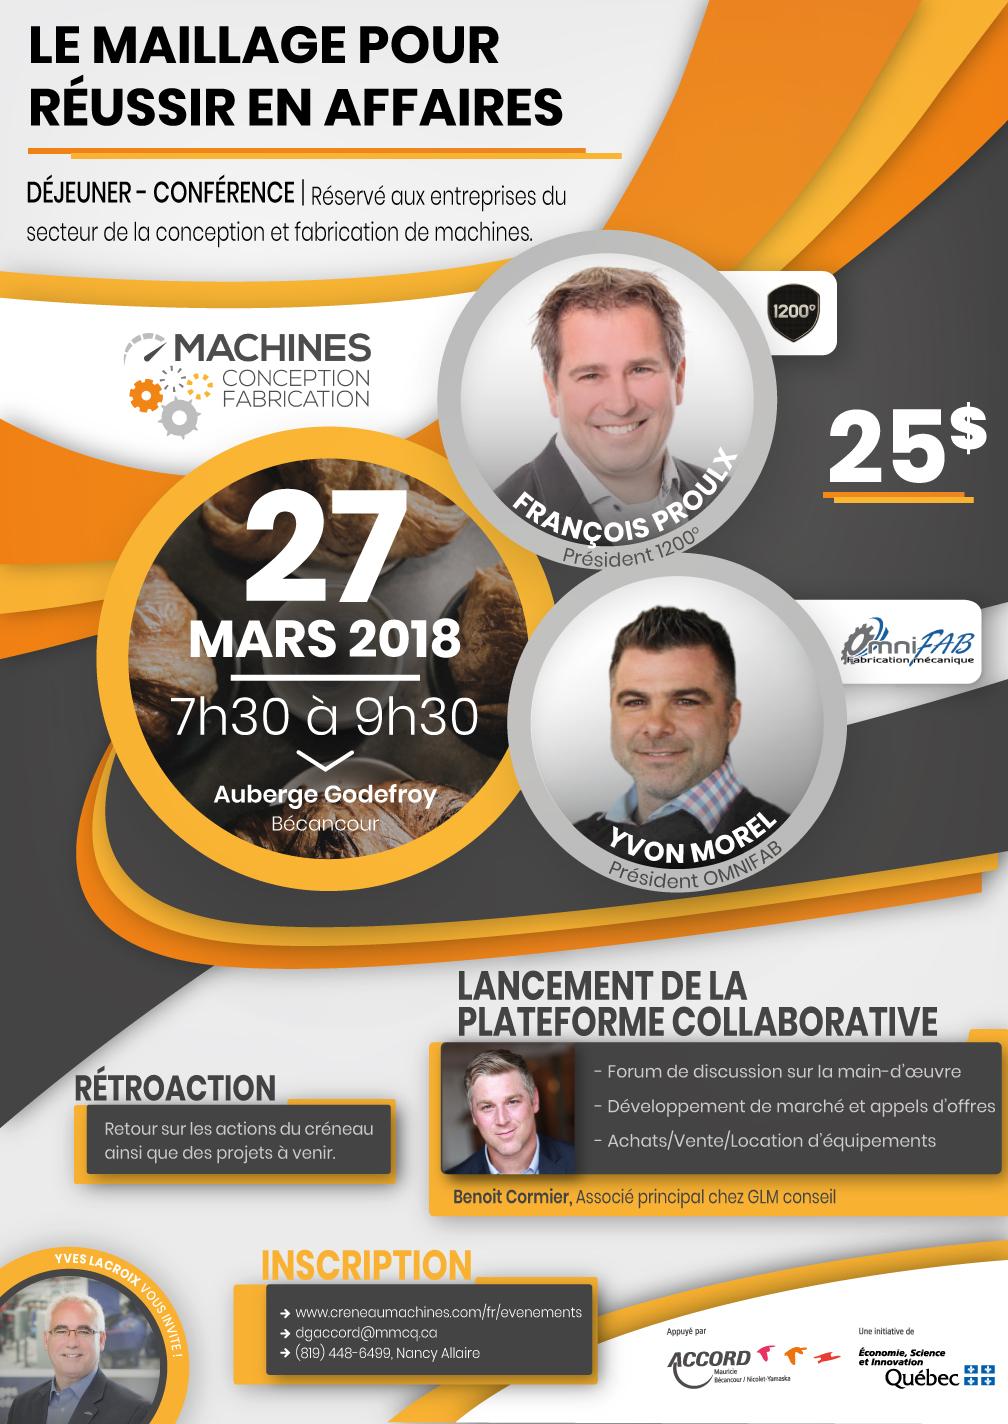 27 mars 2018:  Déjeuner- Conférence- Maillage